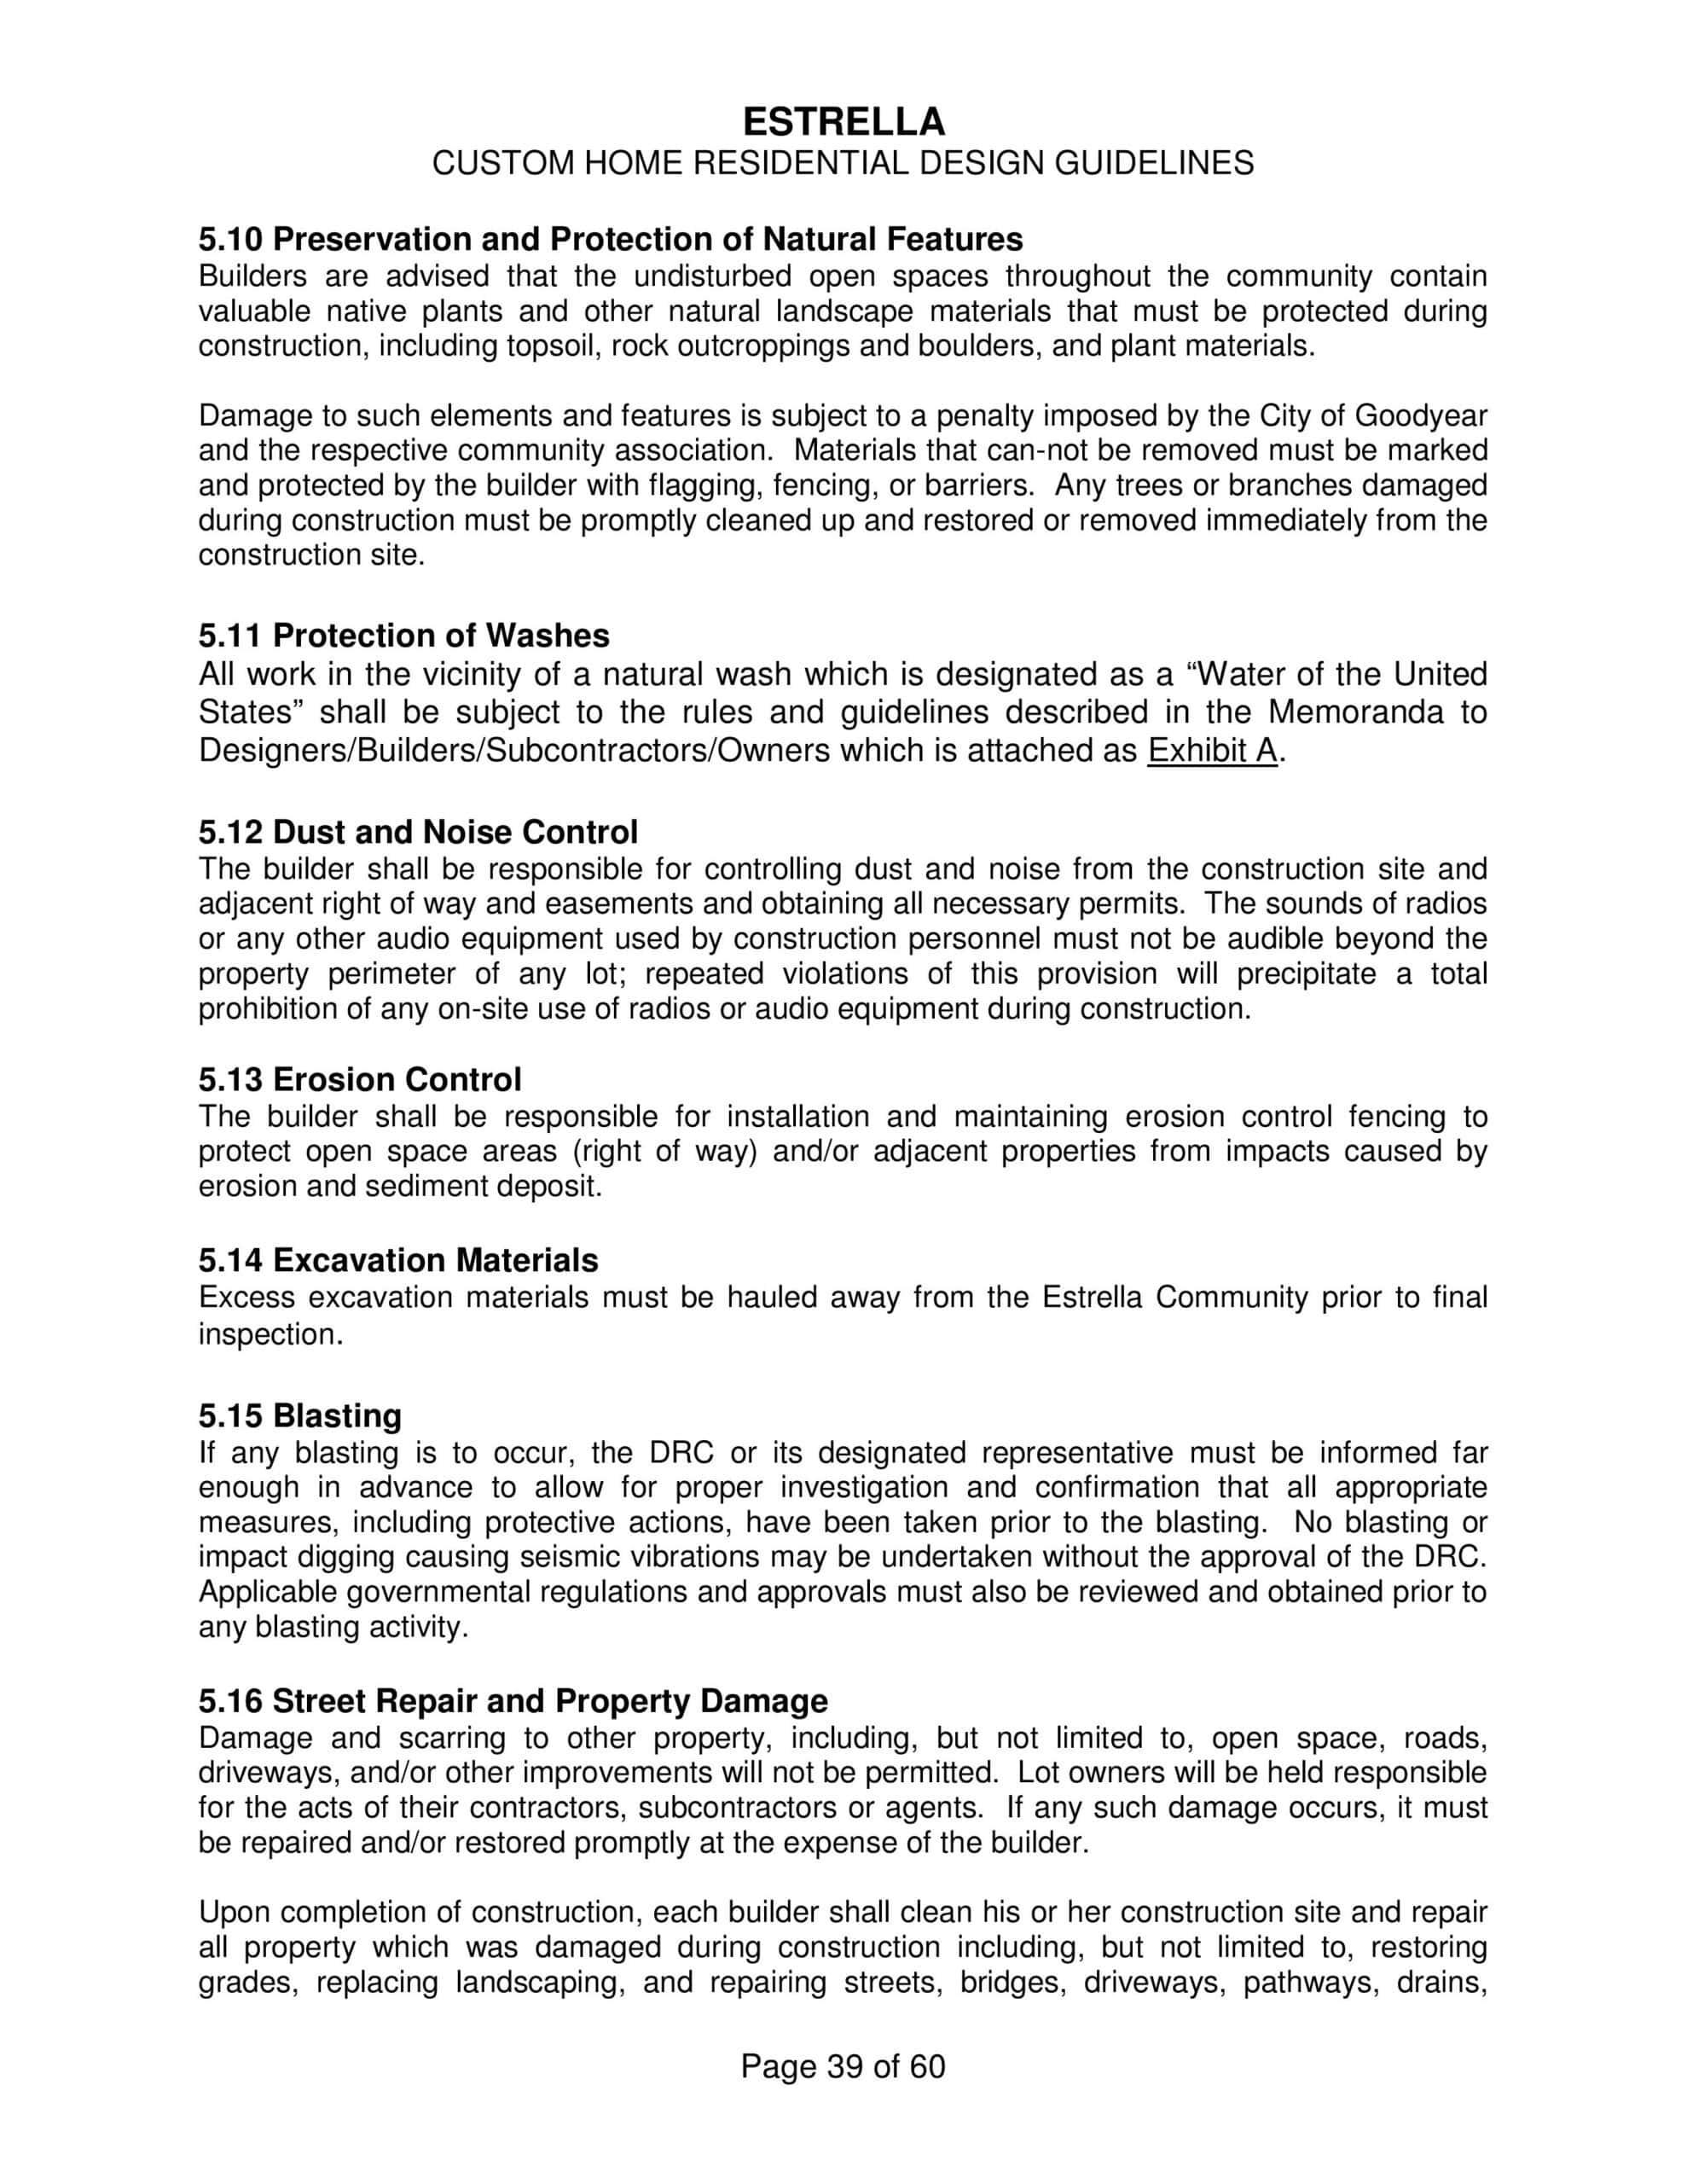 ESTRELLA MOUNTAIN CUSTOM HOME GUIDELINES-page-043